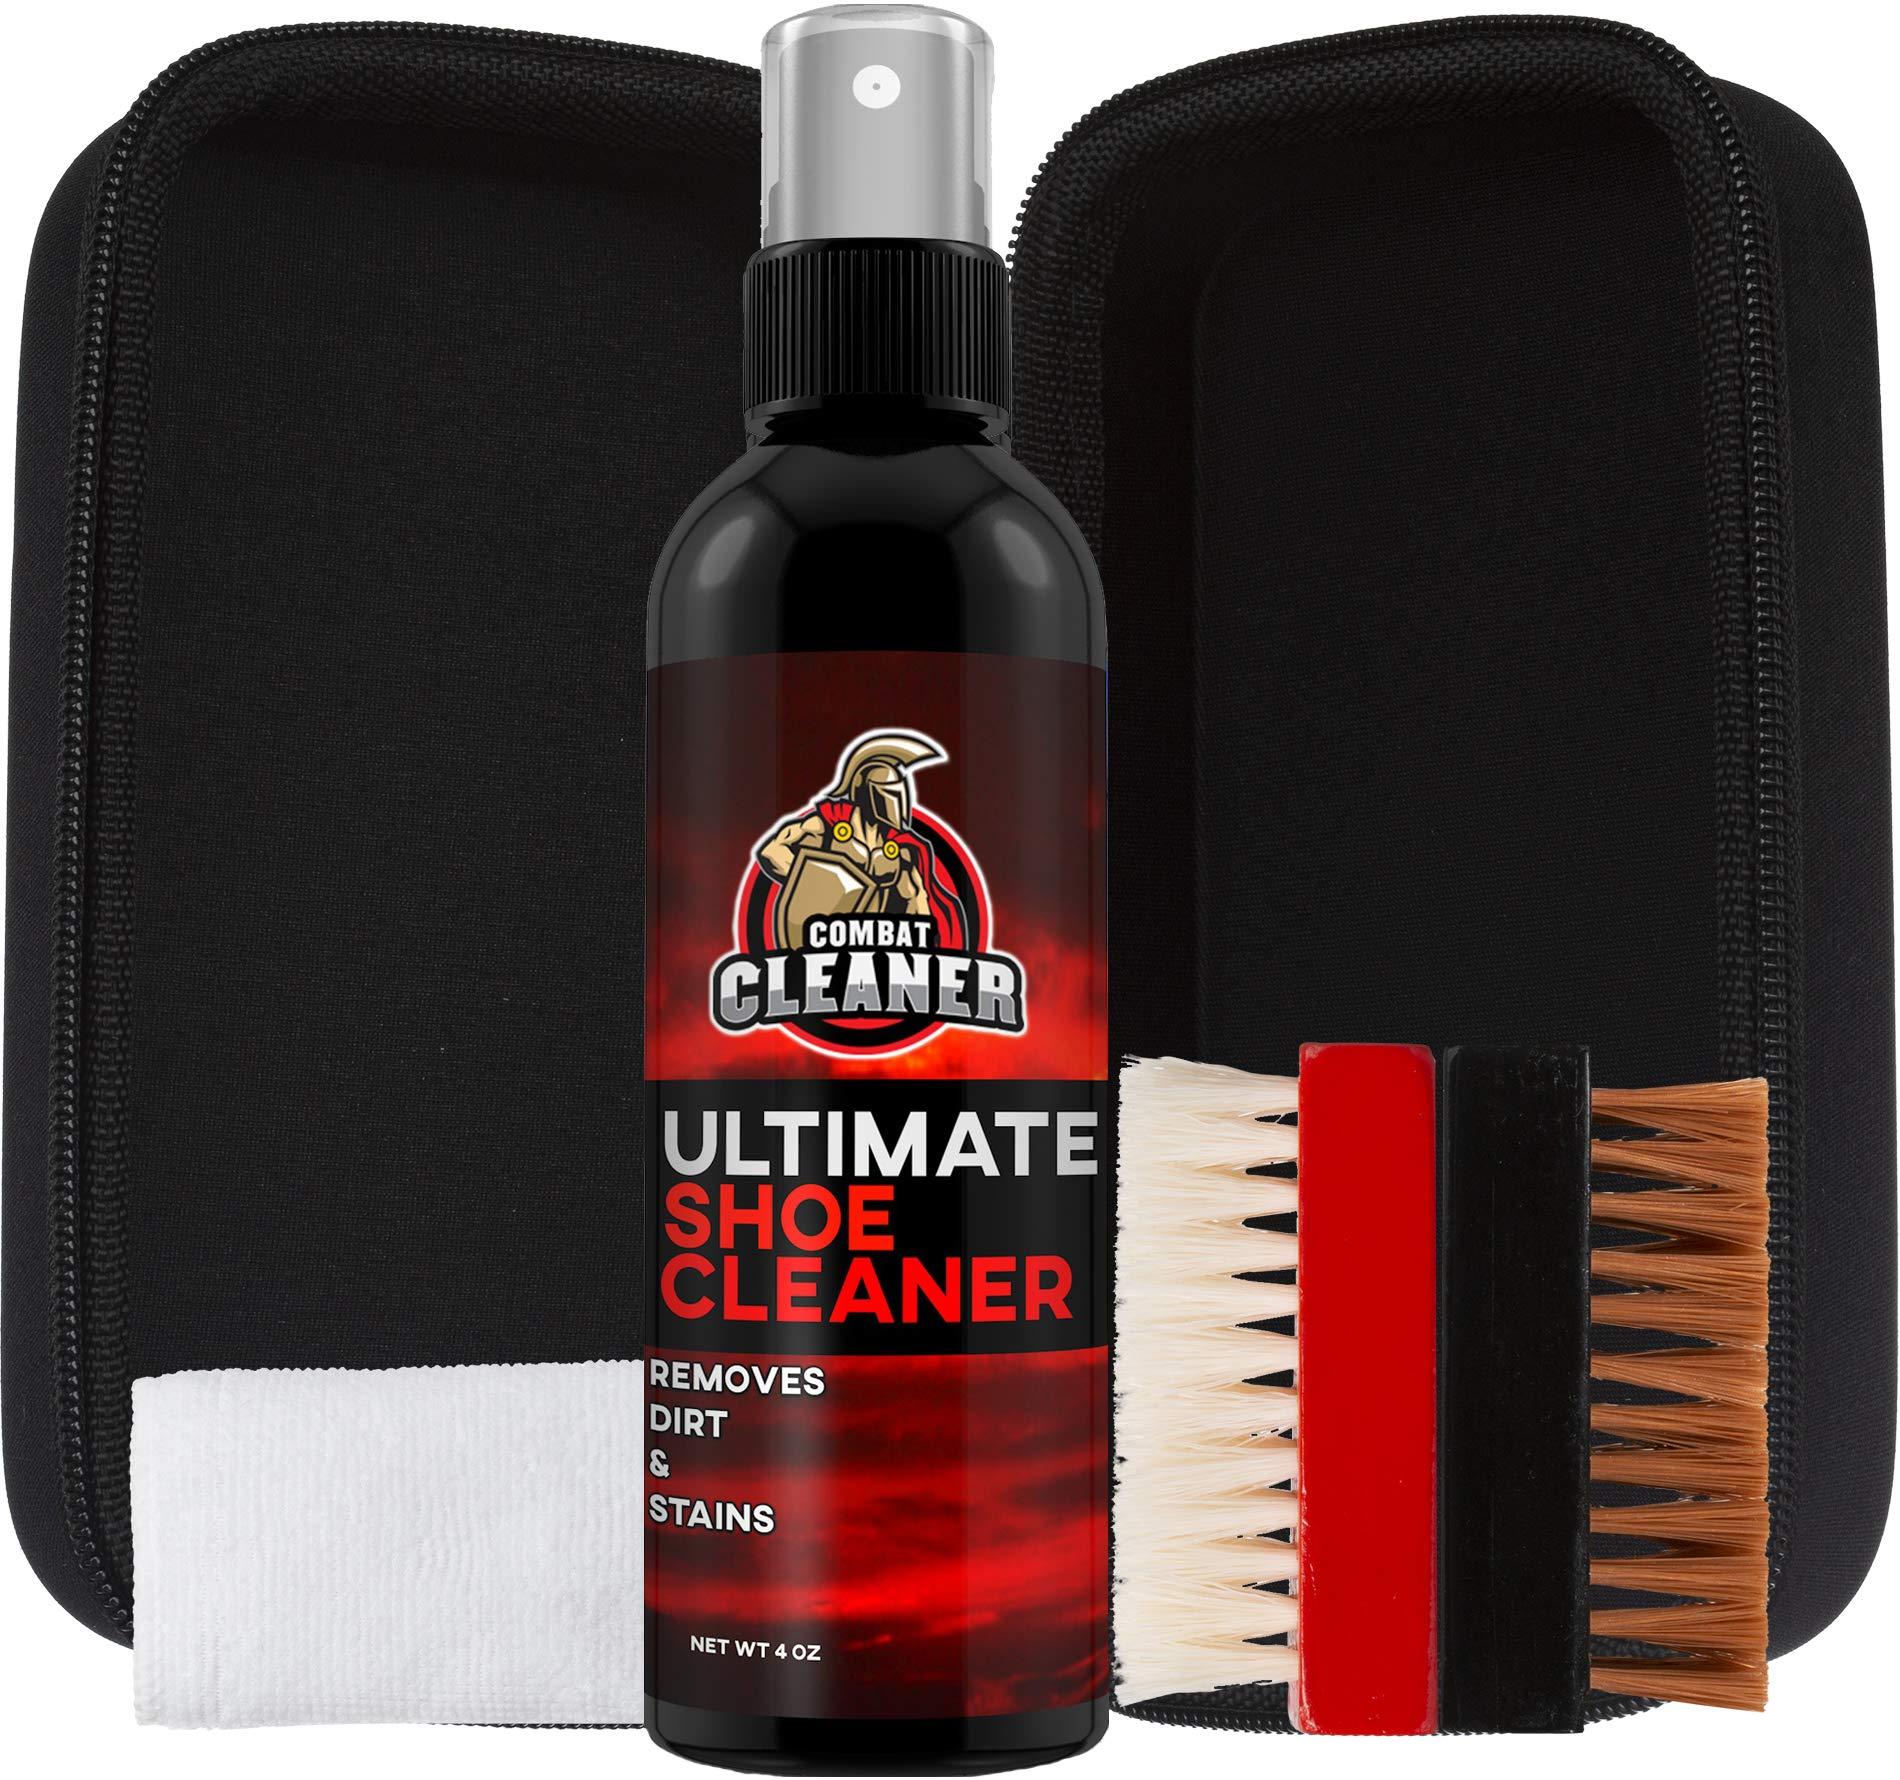 Ultimate Shoe Cleaner Travel Kit de Combat Cleaner | Limpiab